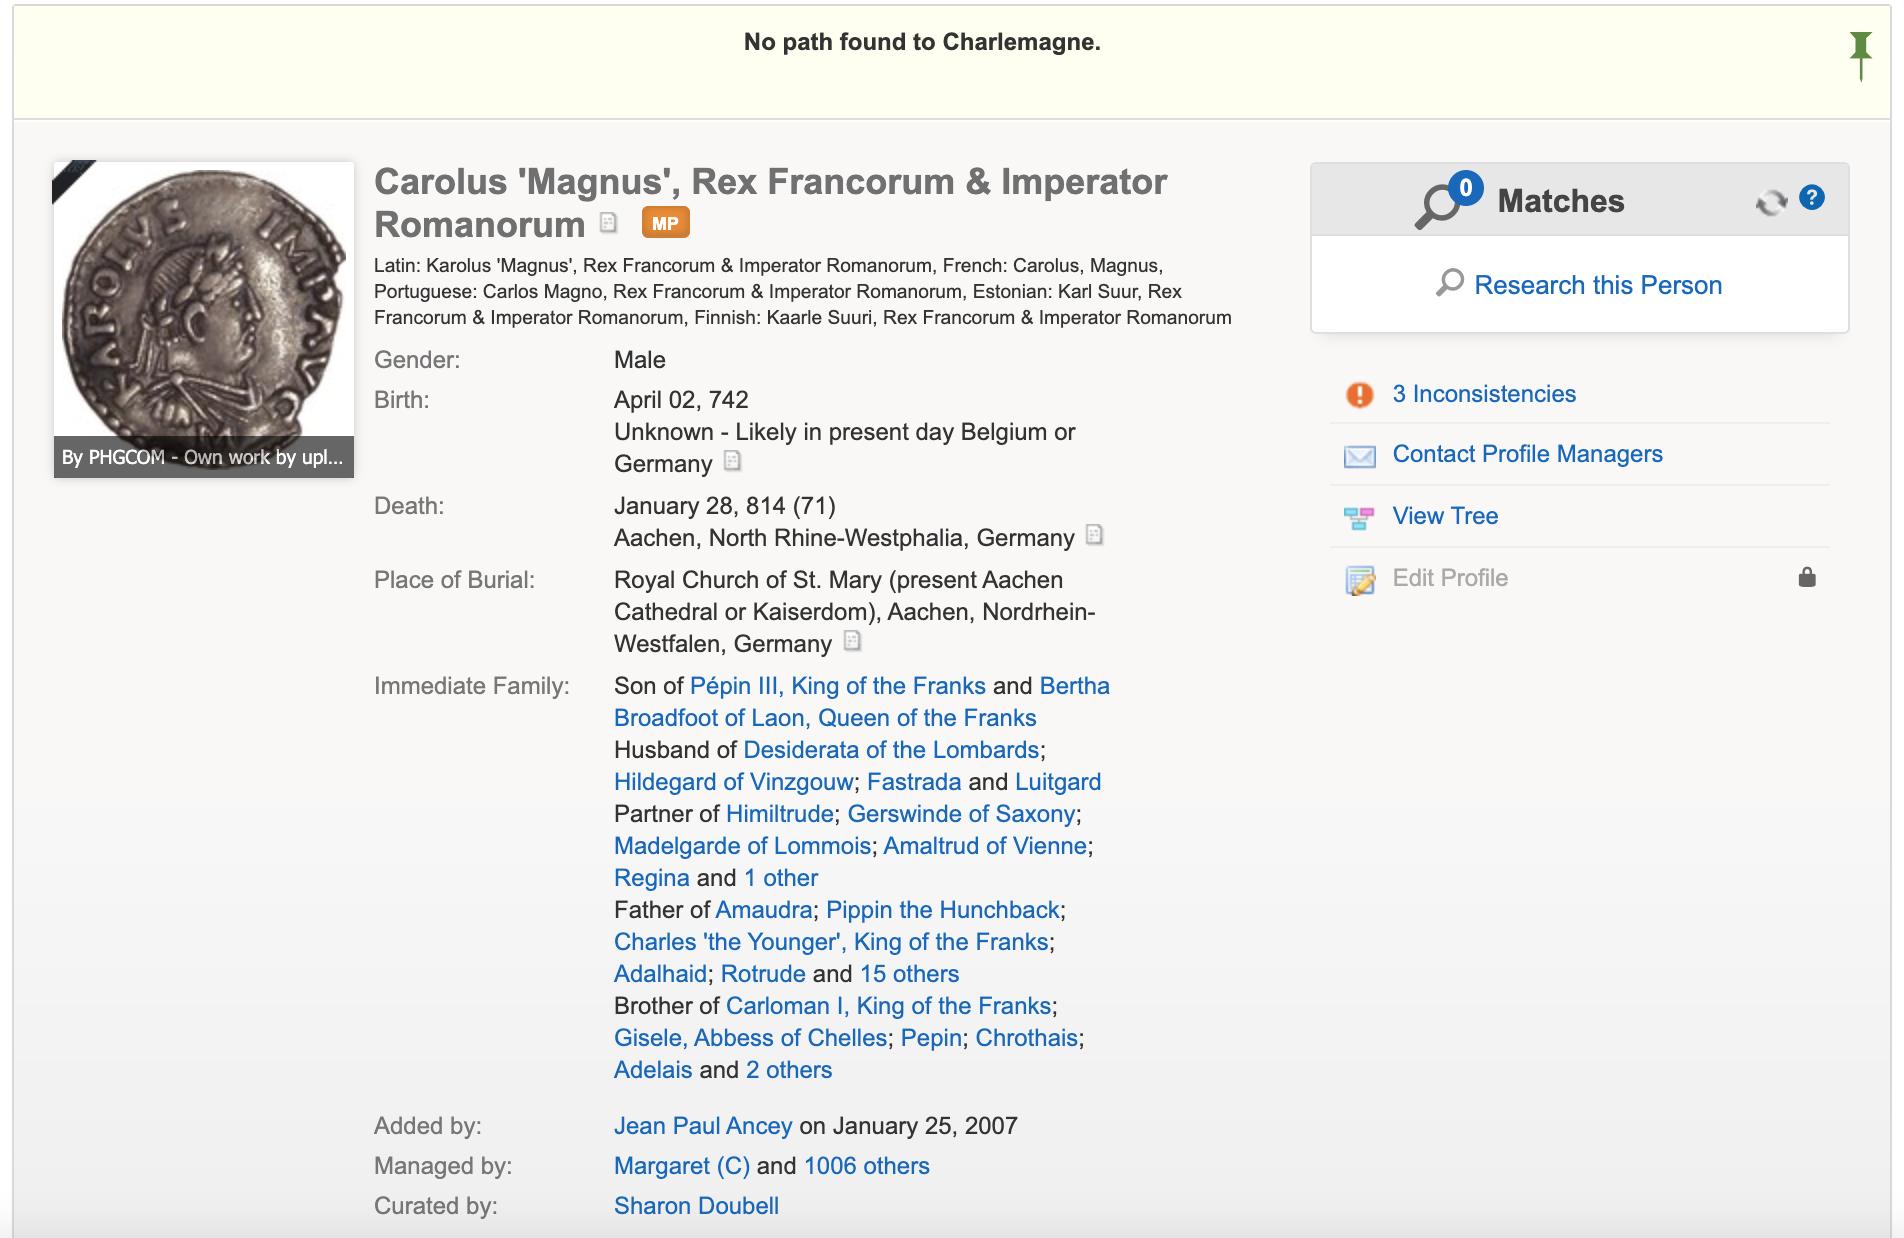 Charlemagne profile on Geni.com